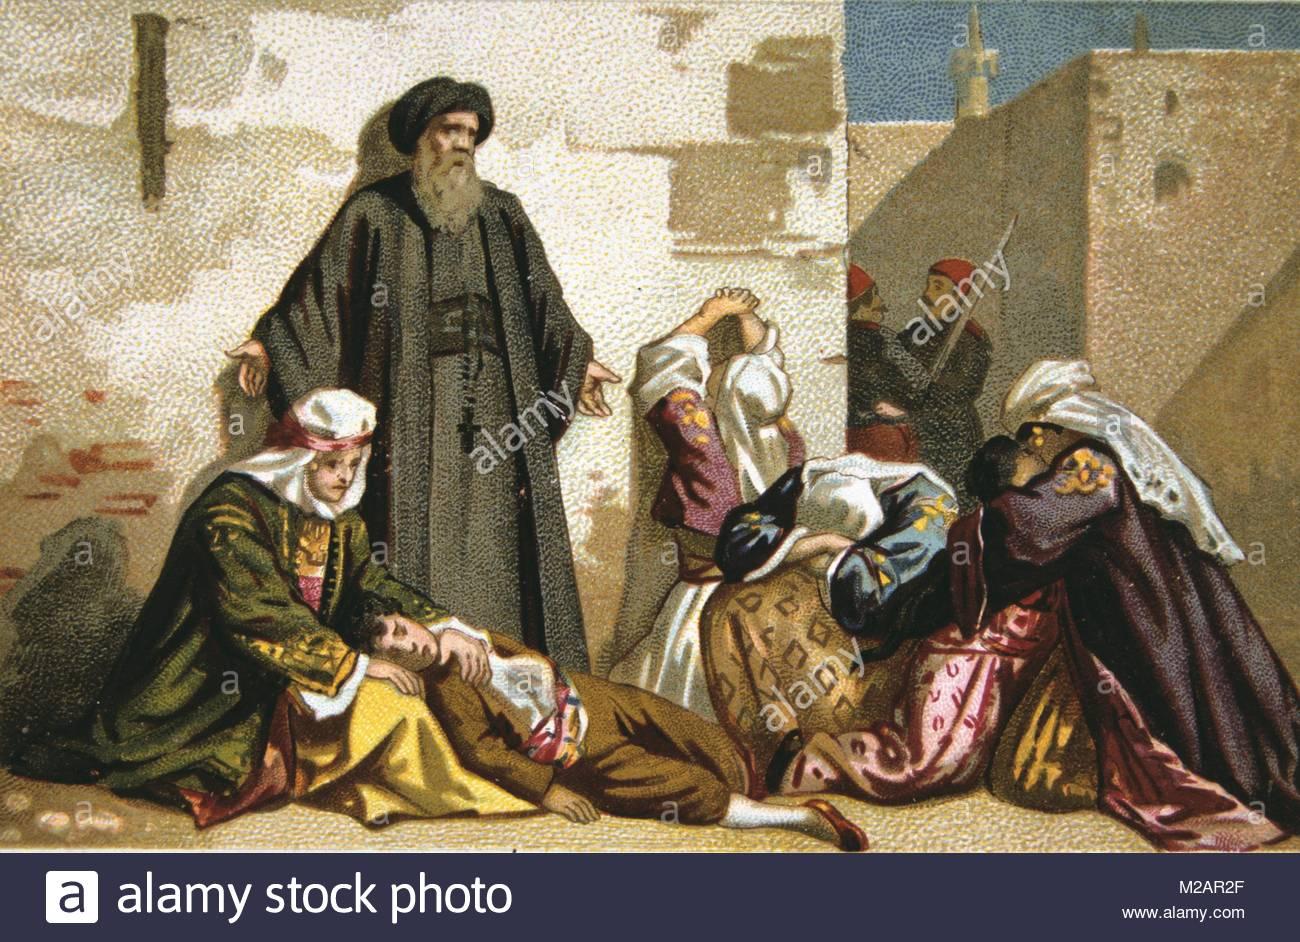 Massacre of Armenians by Ottoman Turks under Abdul Hamid - Stock Image